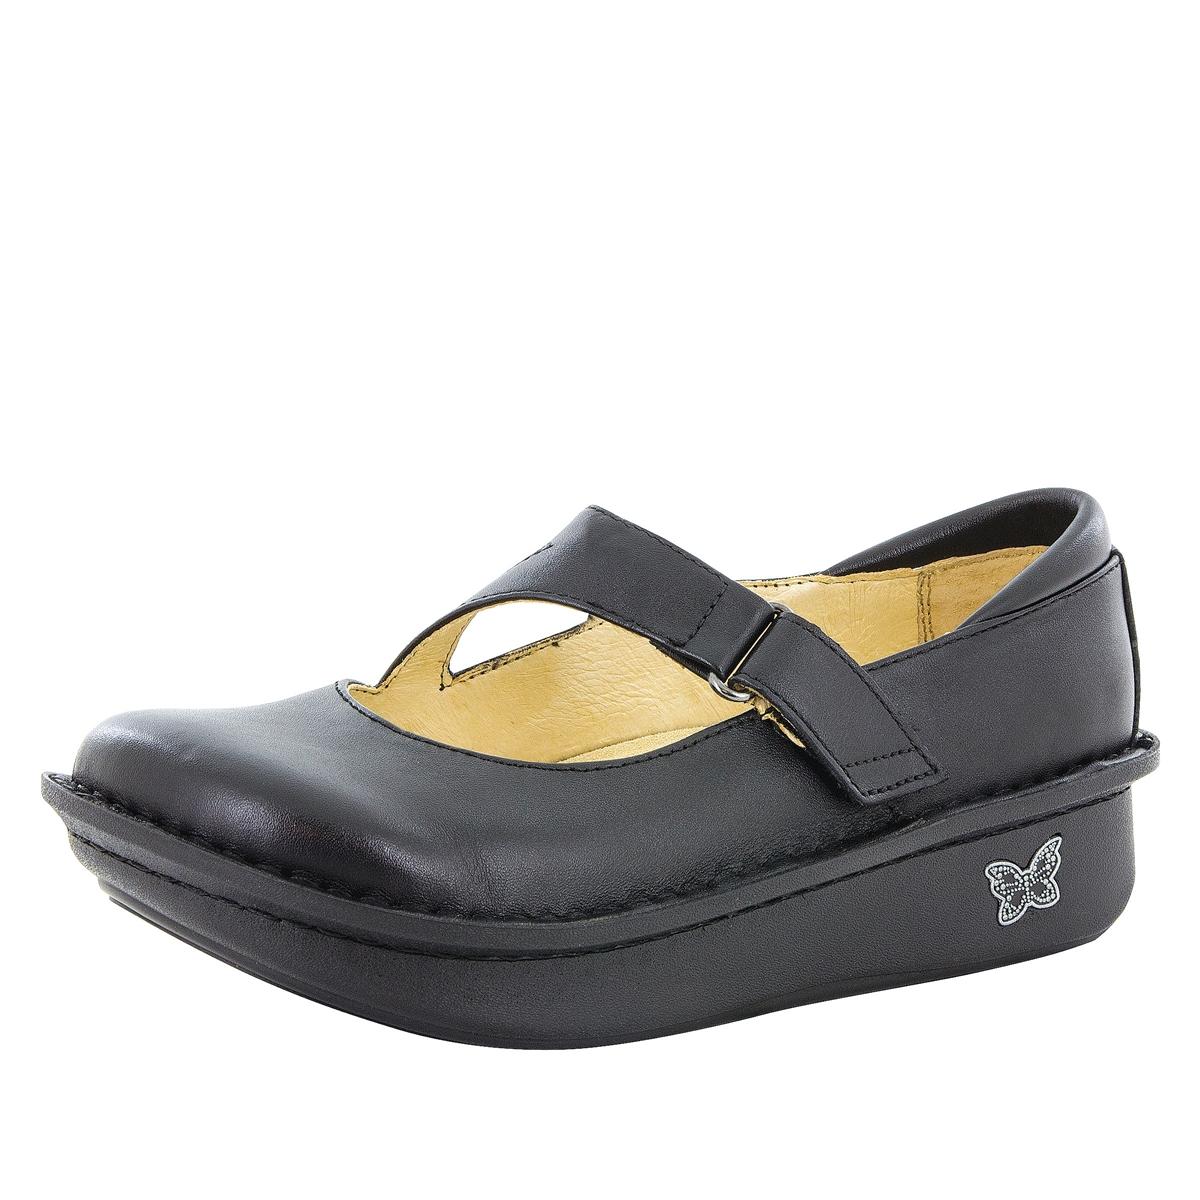 Alegria Shoes - Dayna Black Napa